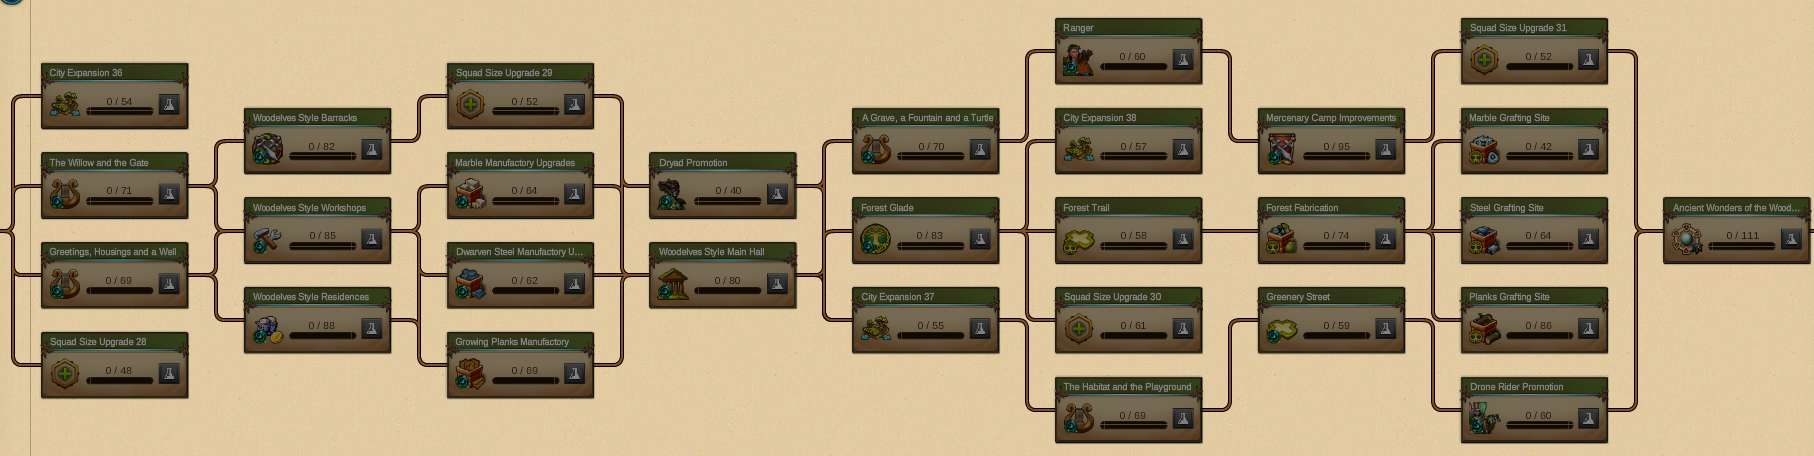 Elvenar Woodelves - Planning Research